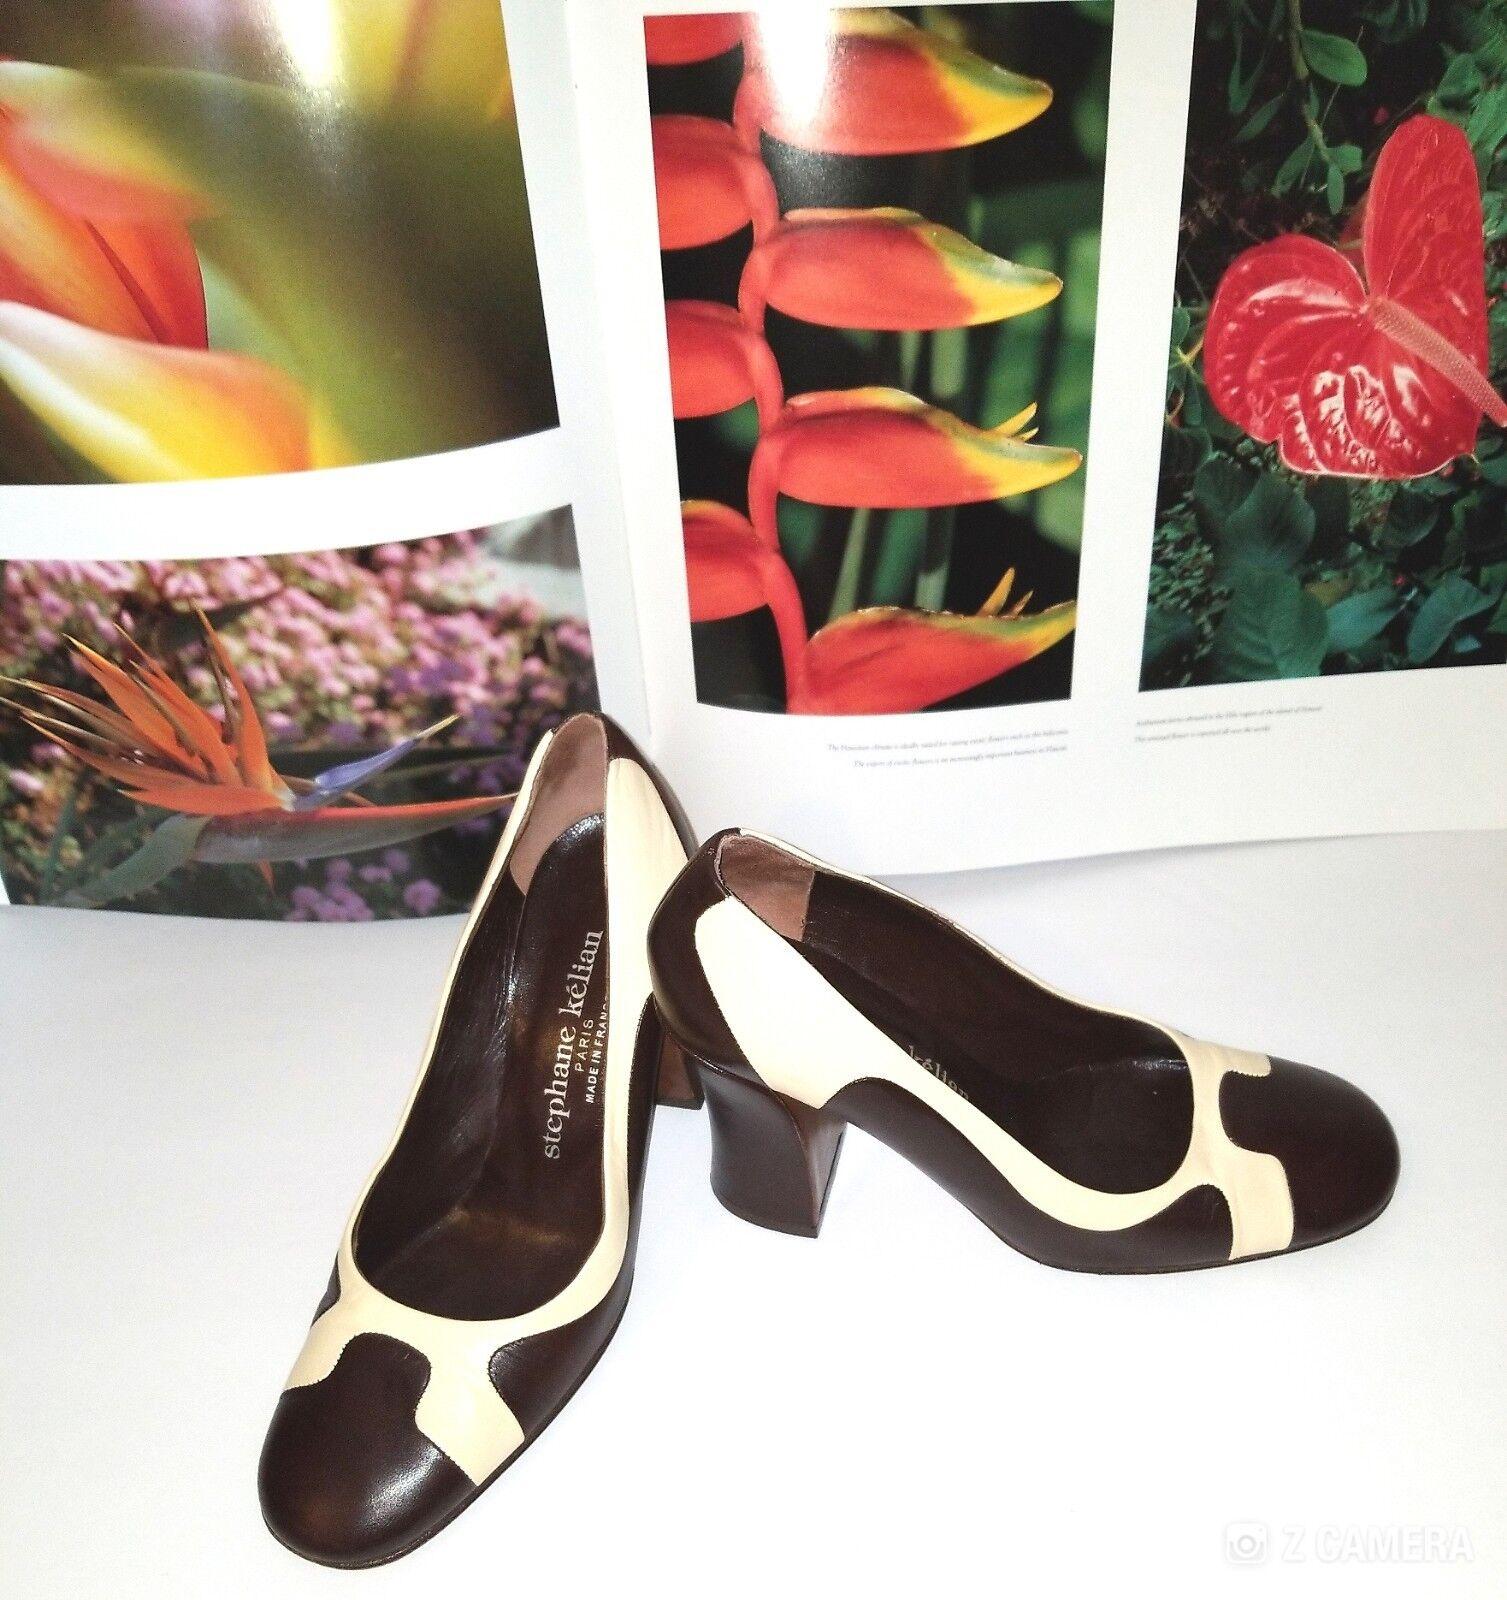 Stephane Kelian Brown Heeled & Cream Leather Chunky Heeled Brown Shoes Size 7.5 d23739